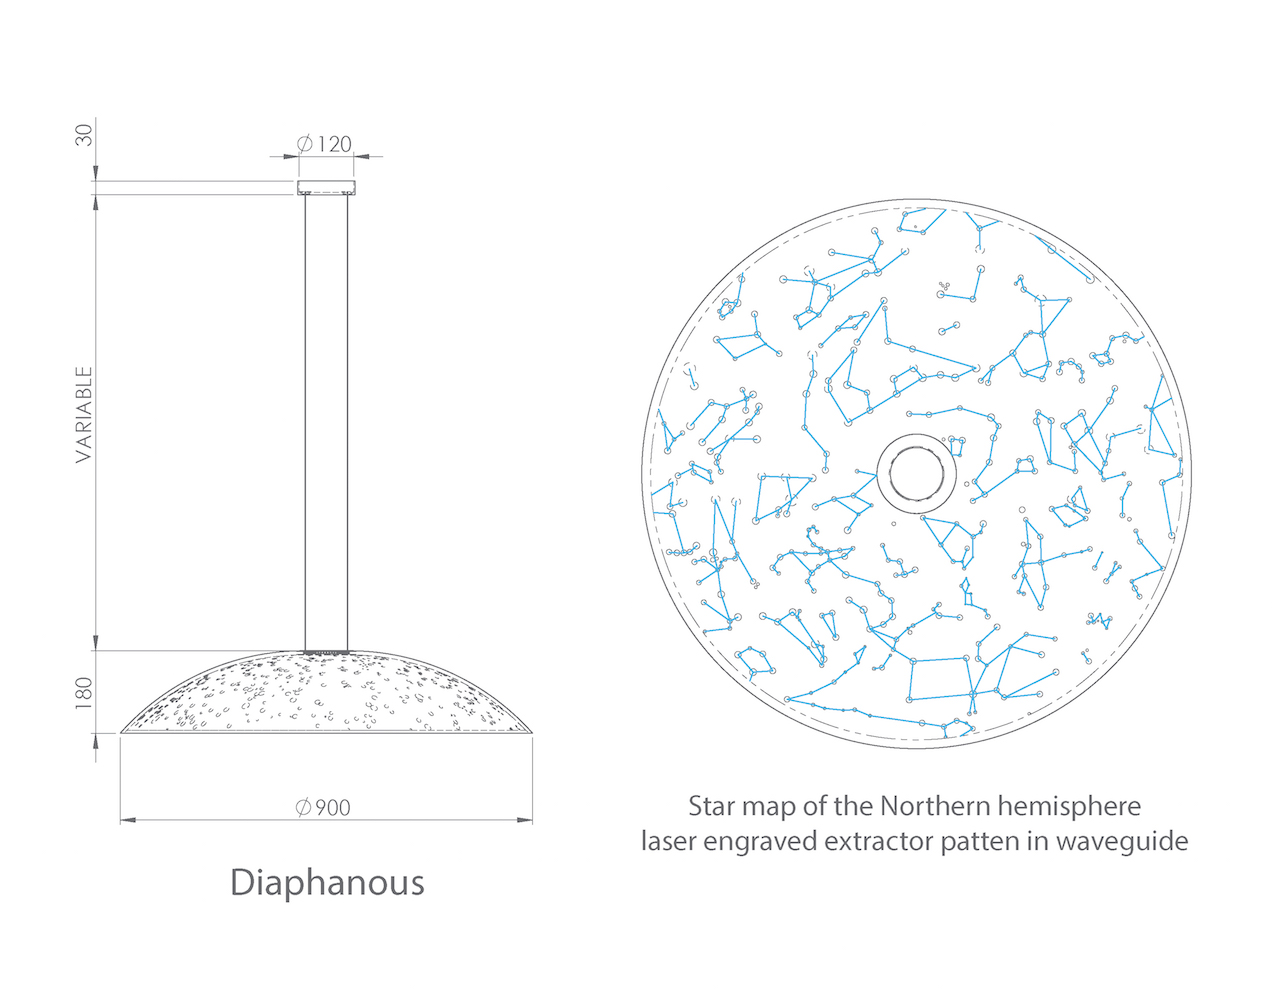 Diaphanous_ES_5.JPG